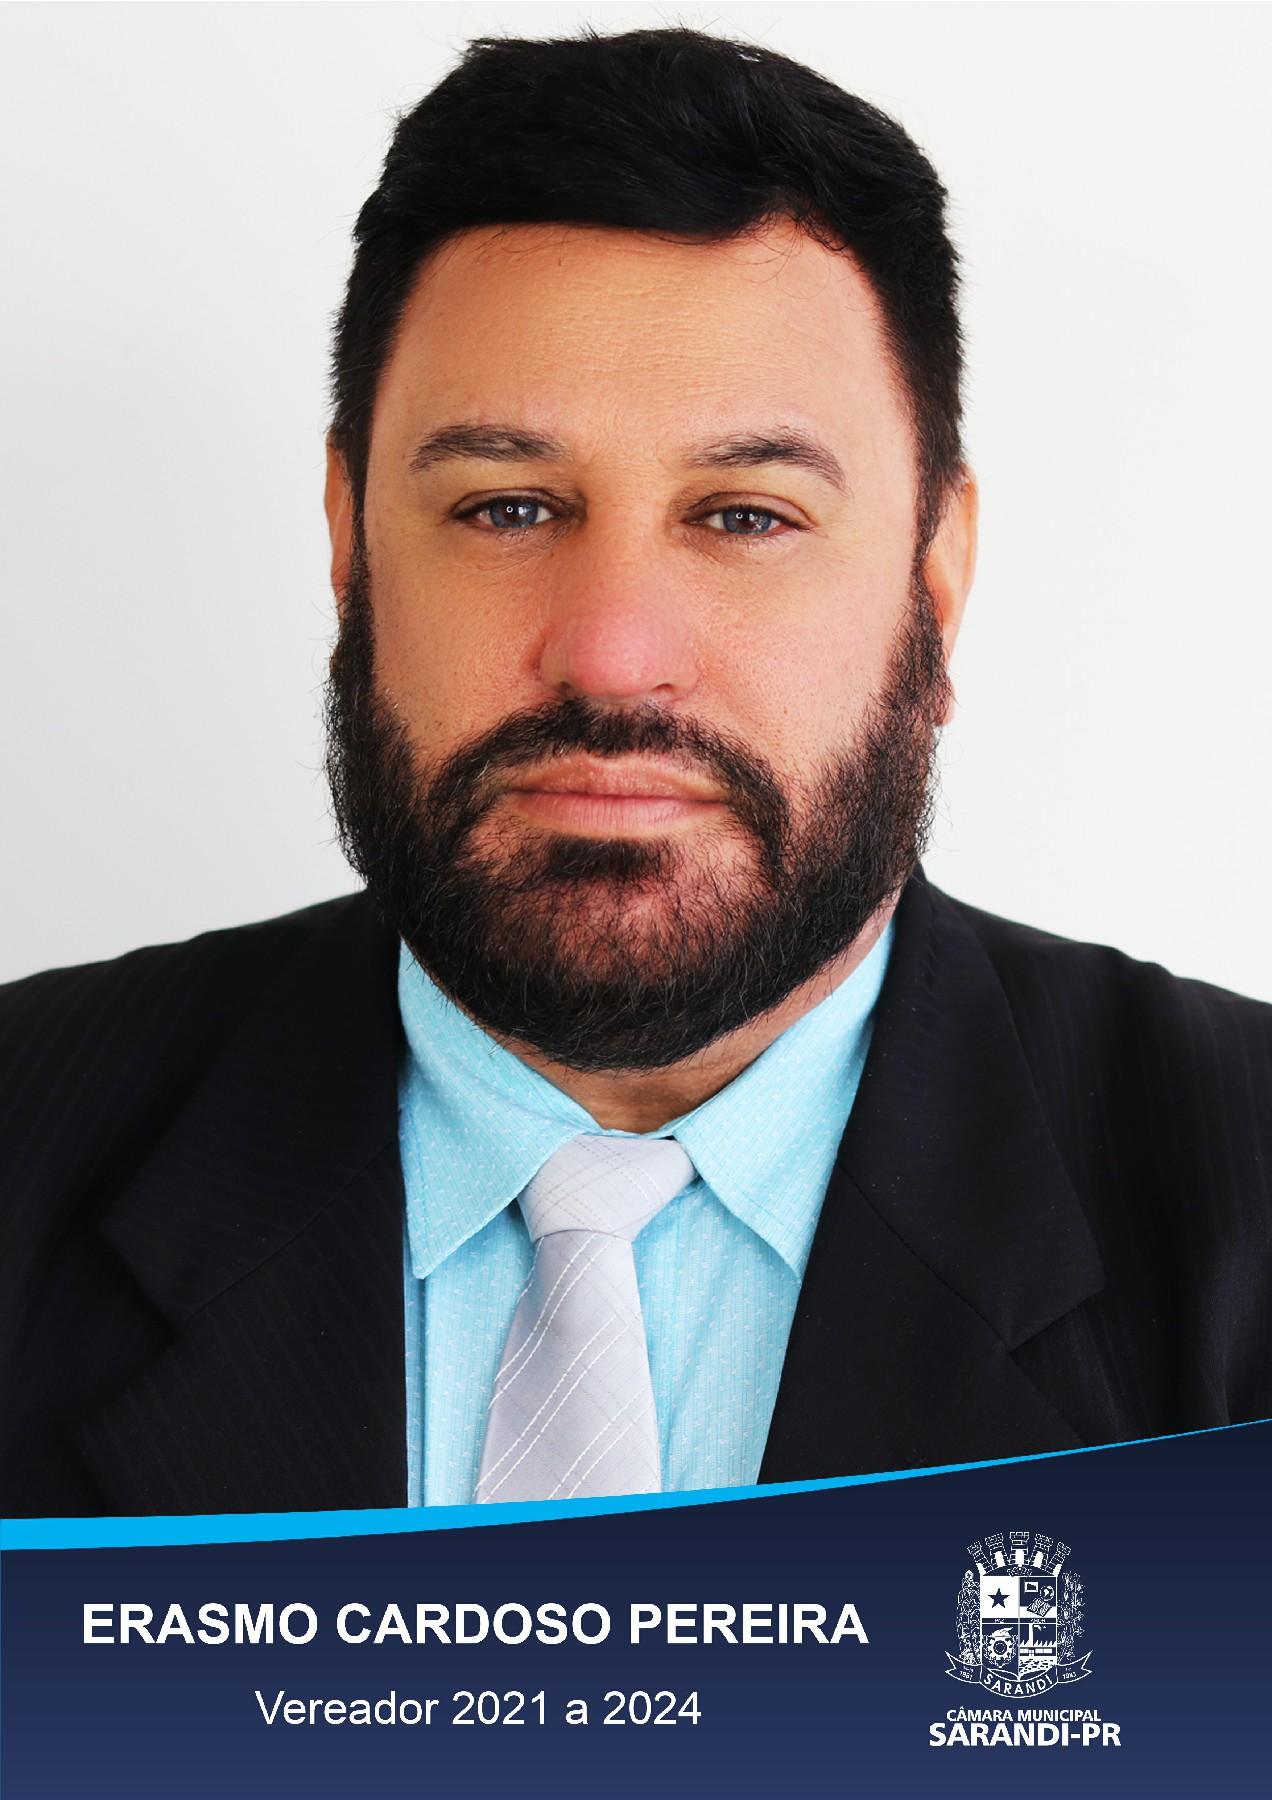 Erasmo Cardoso Pereira